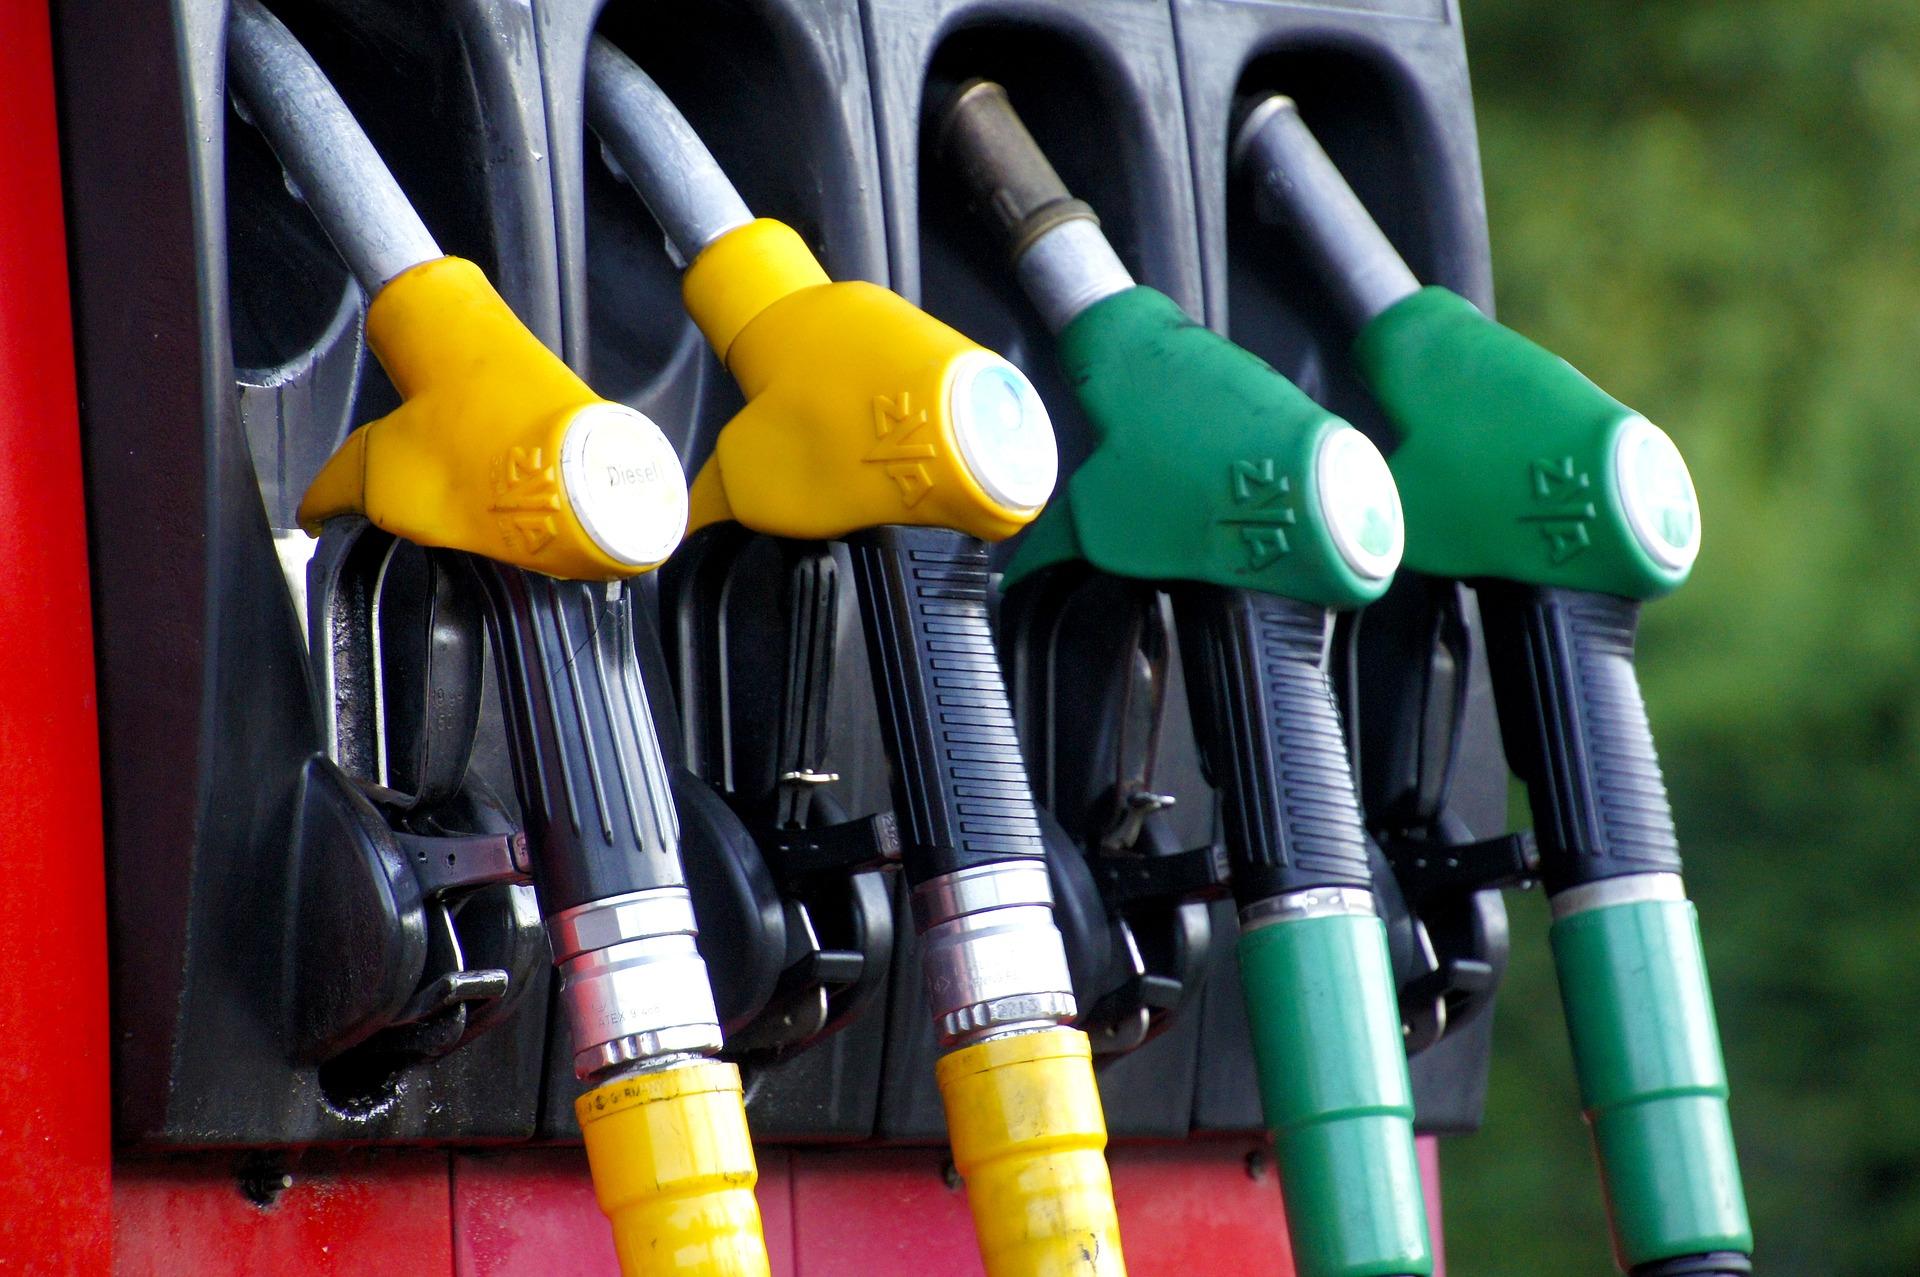 Gobierno destina RD$380 millones para evitar alza de combustibles